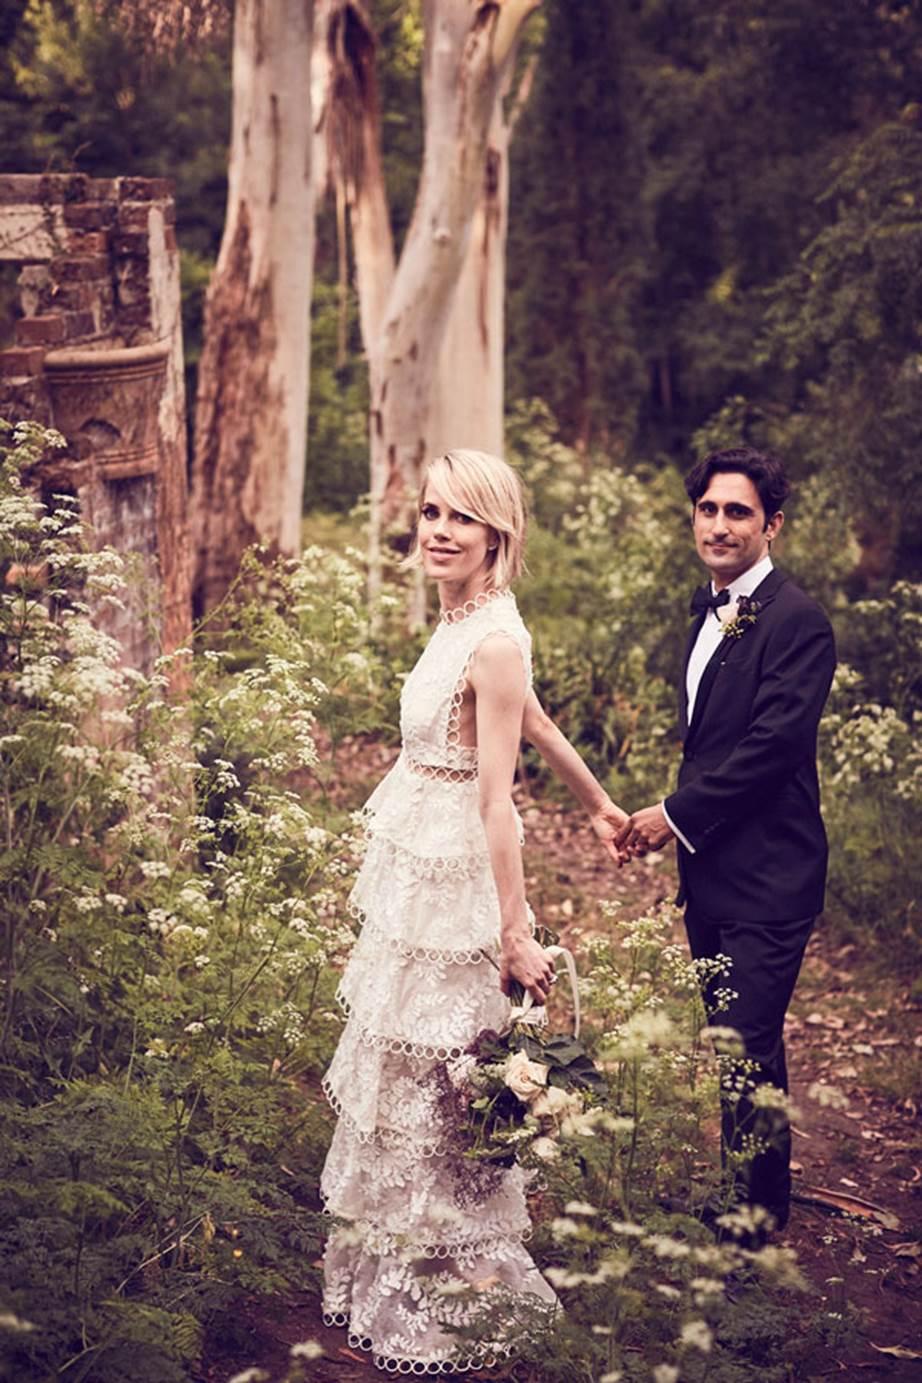 Hopewood House - Weddings  - Harpers Bazaar - Woodland Wedding in the Souther Highlands - Alyssa and Adriano - Ruins Gardens.jpg